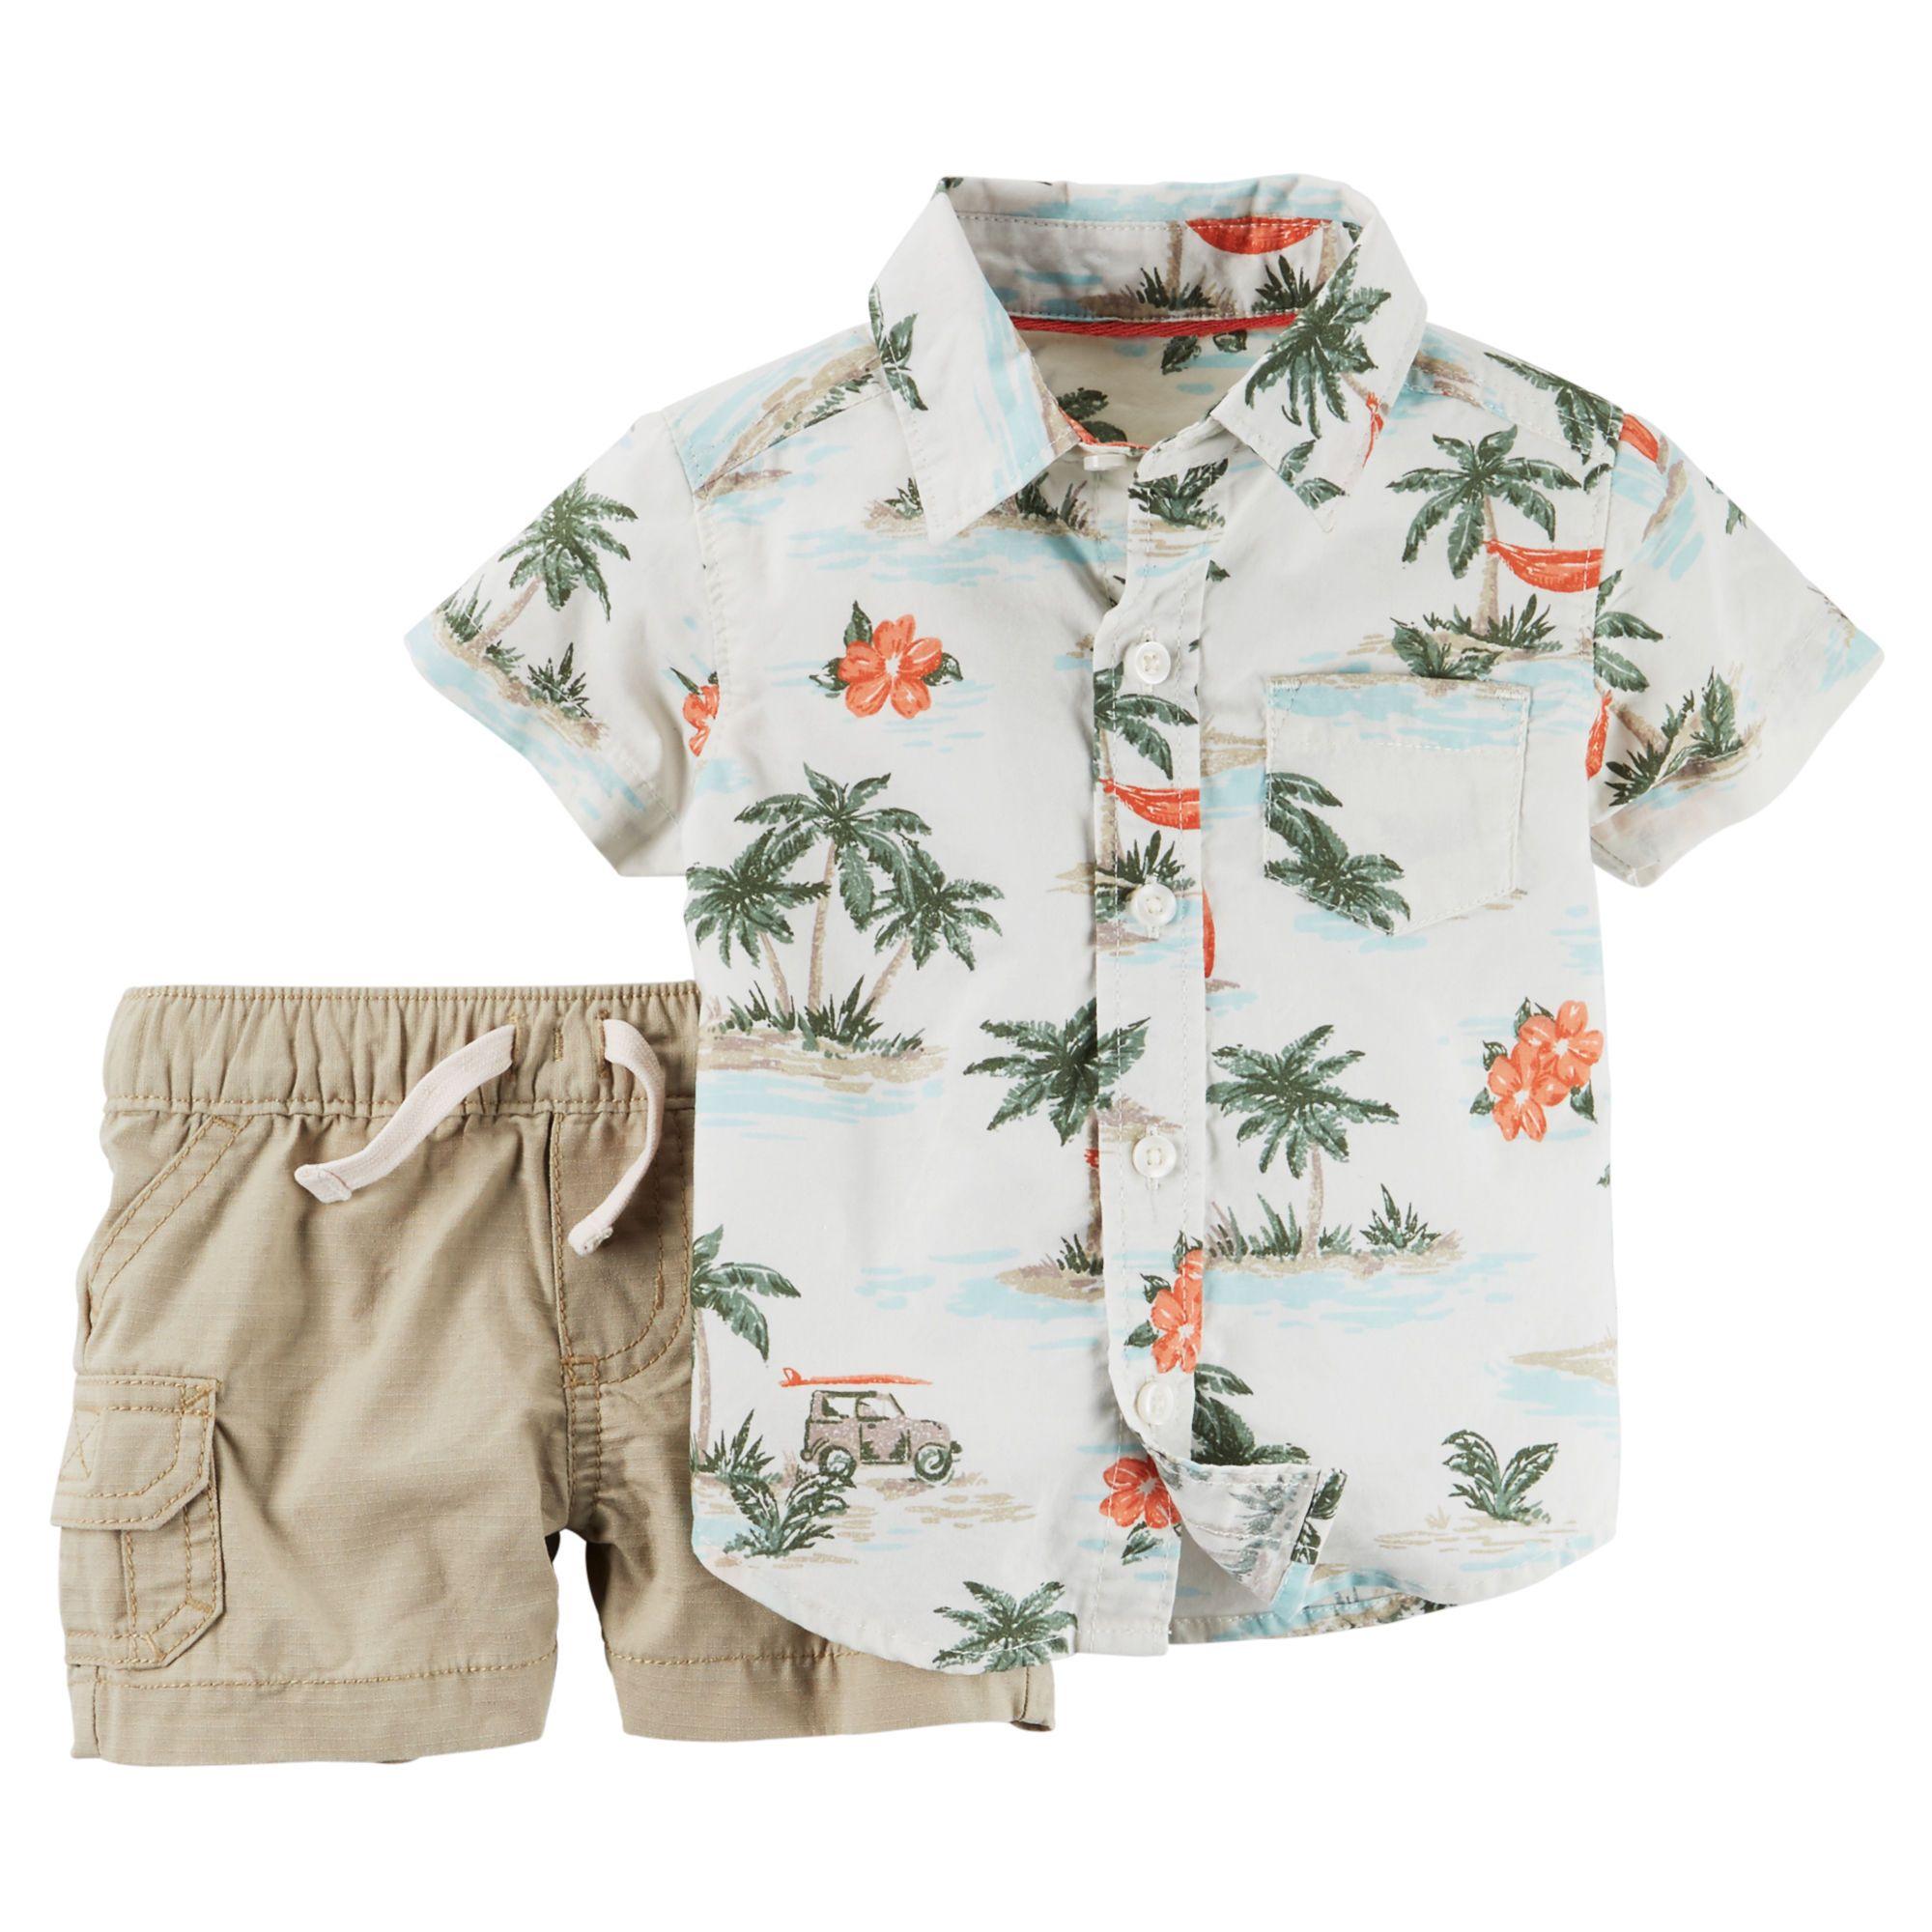 c51c6c059be6 2-Piece Shirt & Short Set   Baby Kingston   Carters baby boys, Baby ...